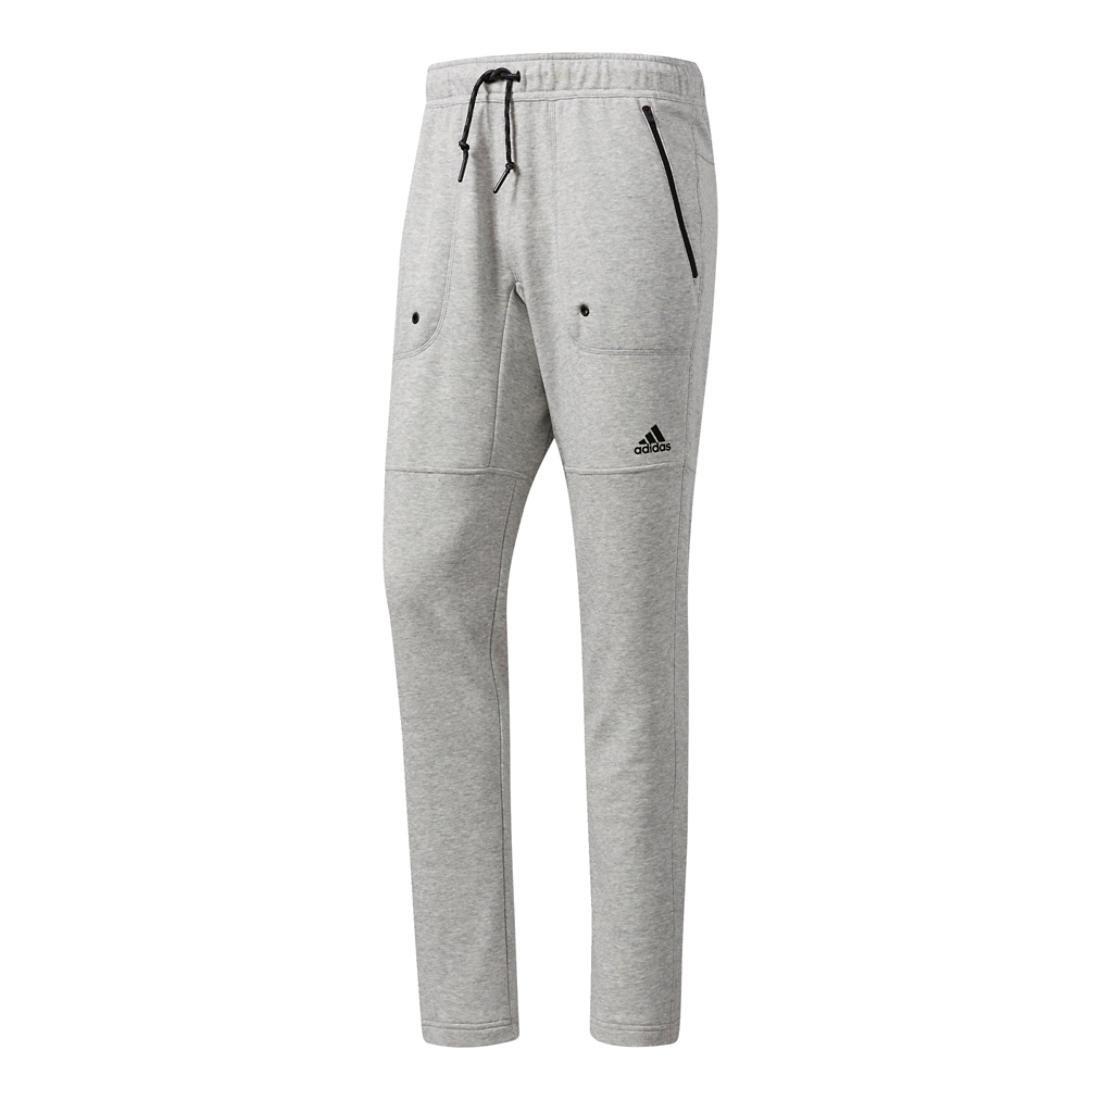 1383c949 Amazon.com: adidas Men's Athletics French Terry Pants: Clothing